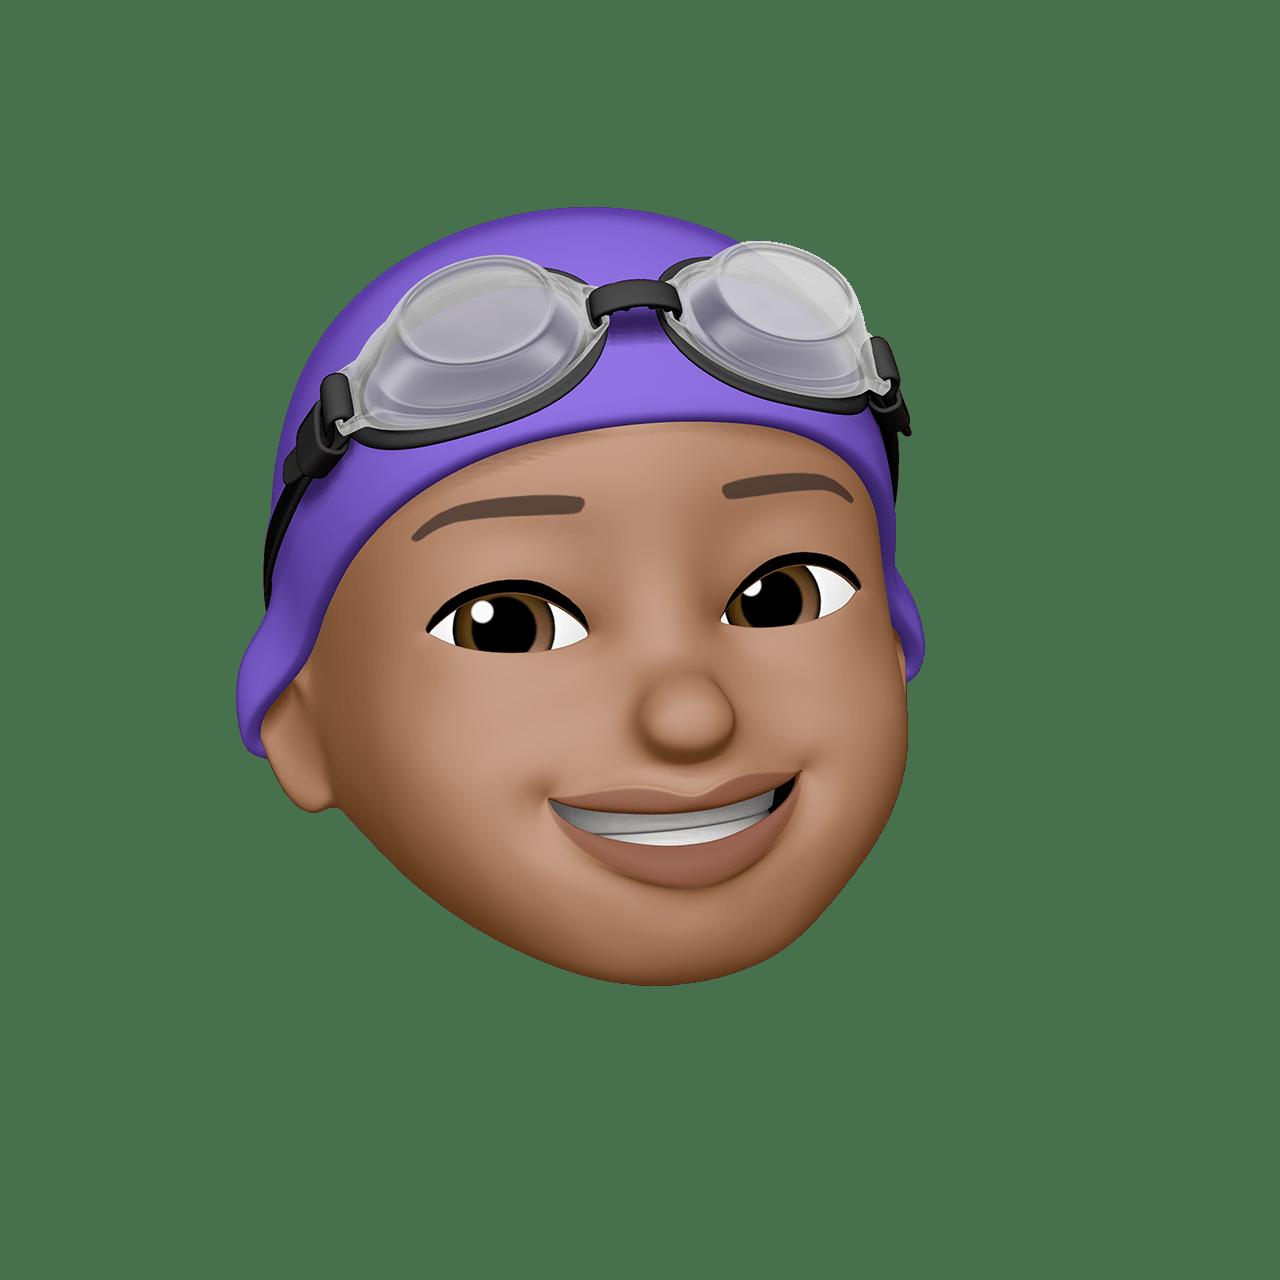 Apple Unveils New Emoji, Face Mask Memoji Characters Durag Fist Bump Transgender Bubble Tea